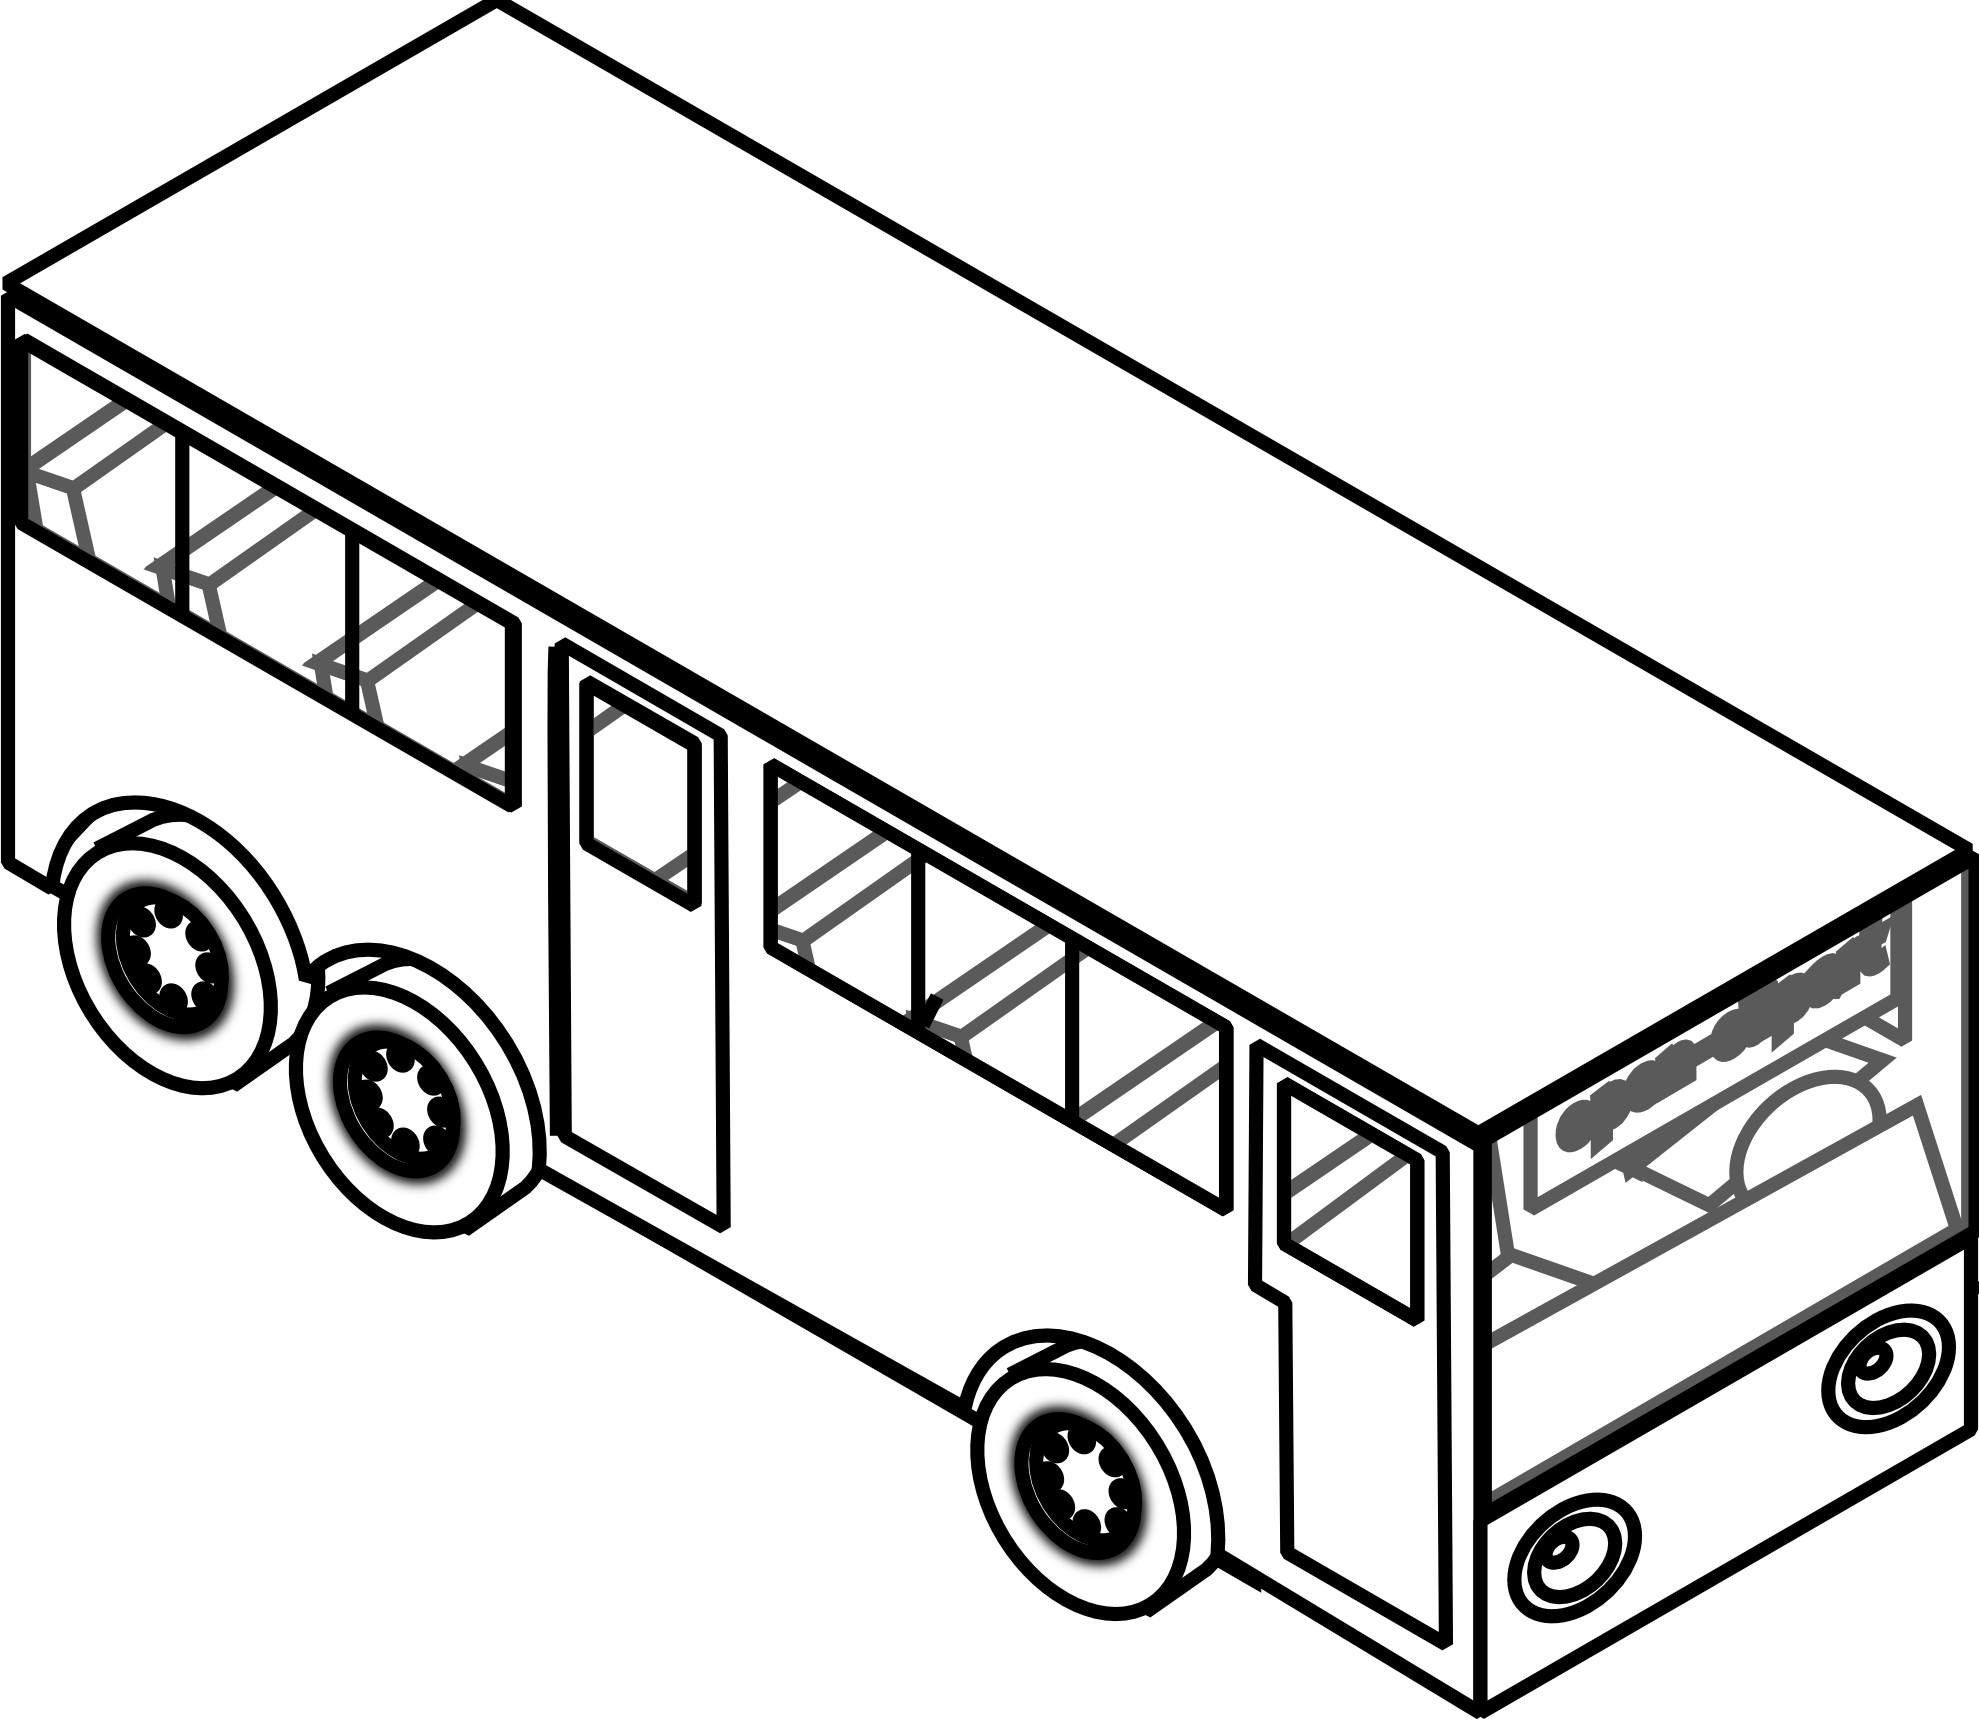 clip royalty free stock Passenger Train Drawing at GetDrawings